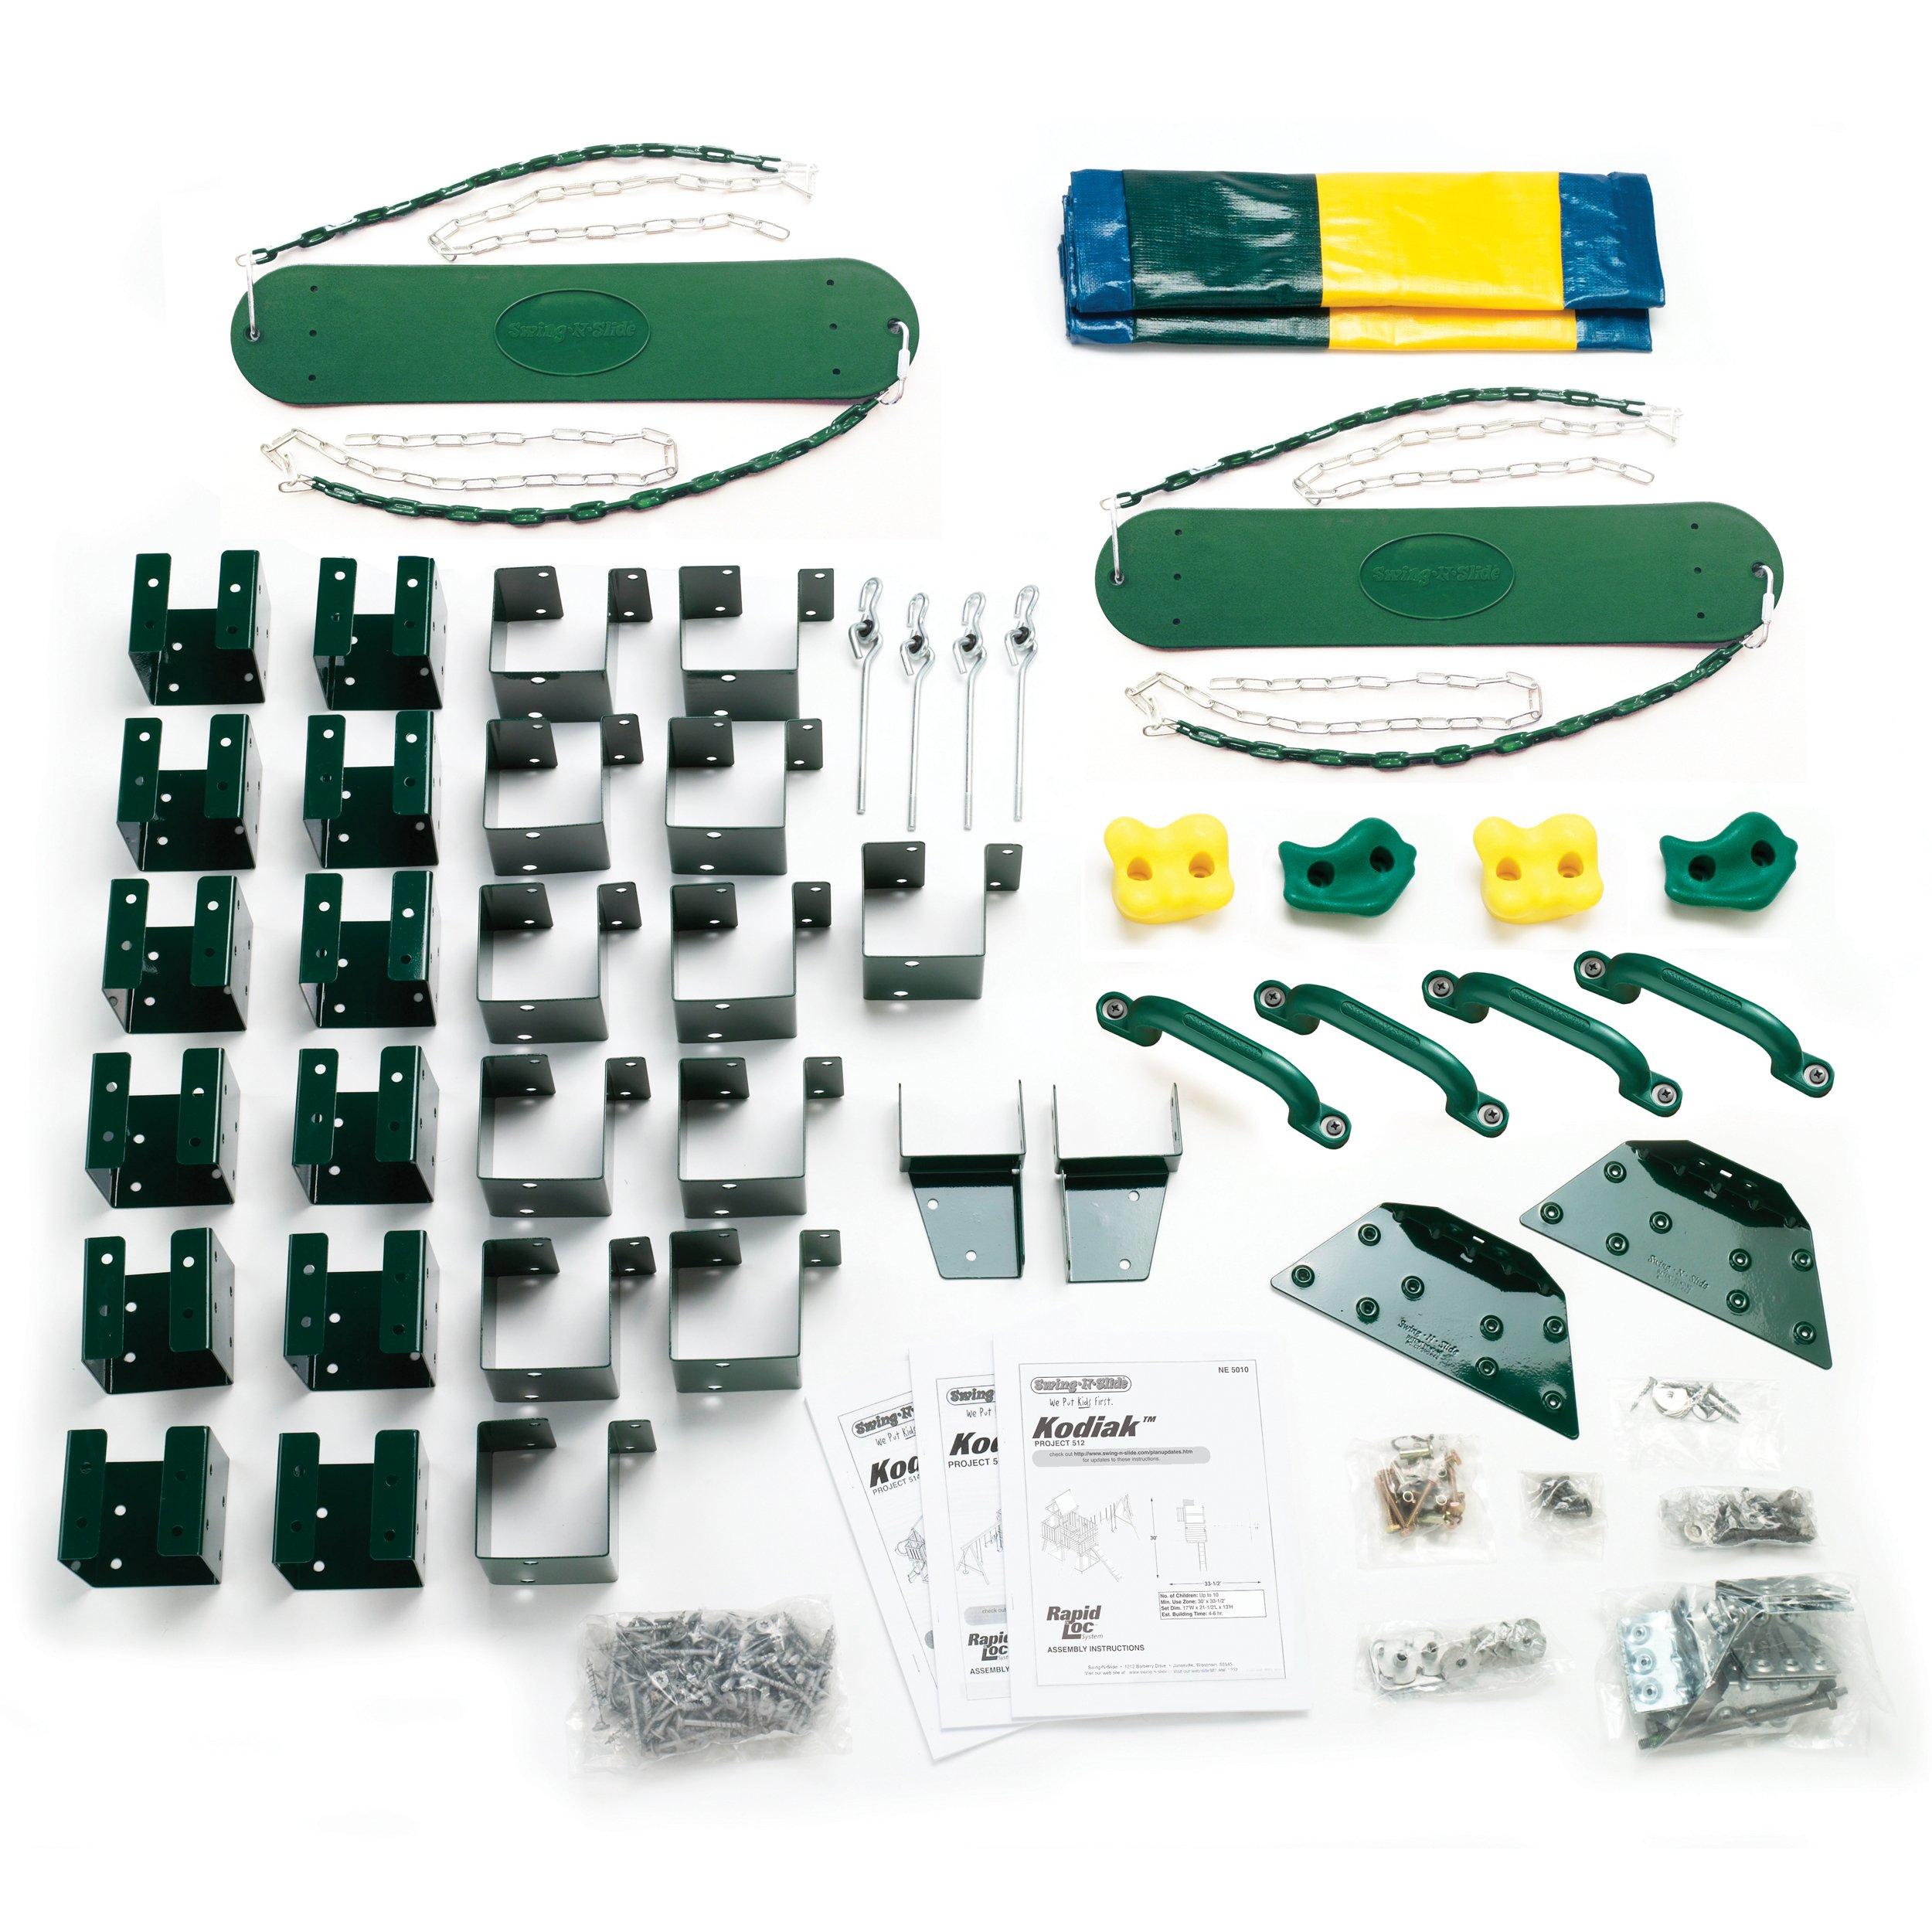 Kodiak Custom Play Set Hardware Kit (wood not included) by Swing-N-Slide